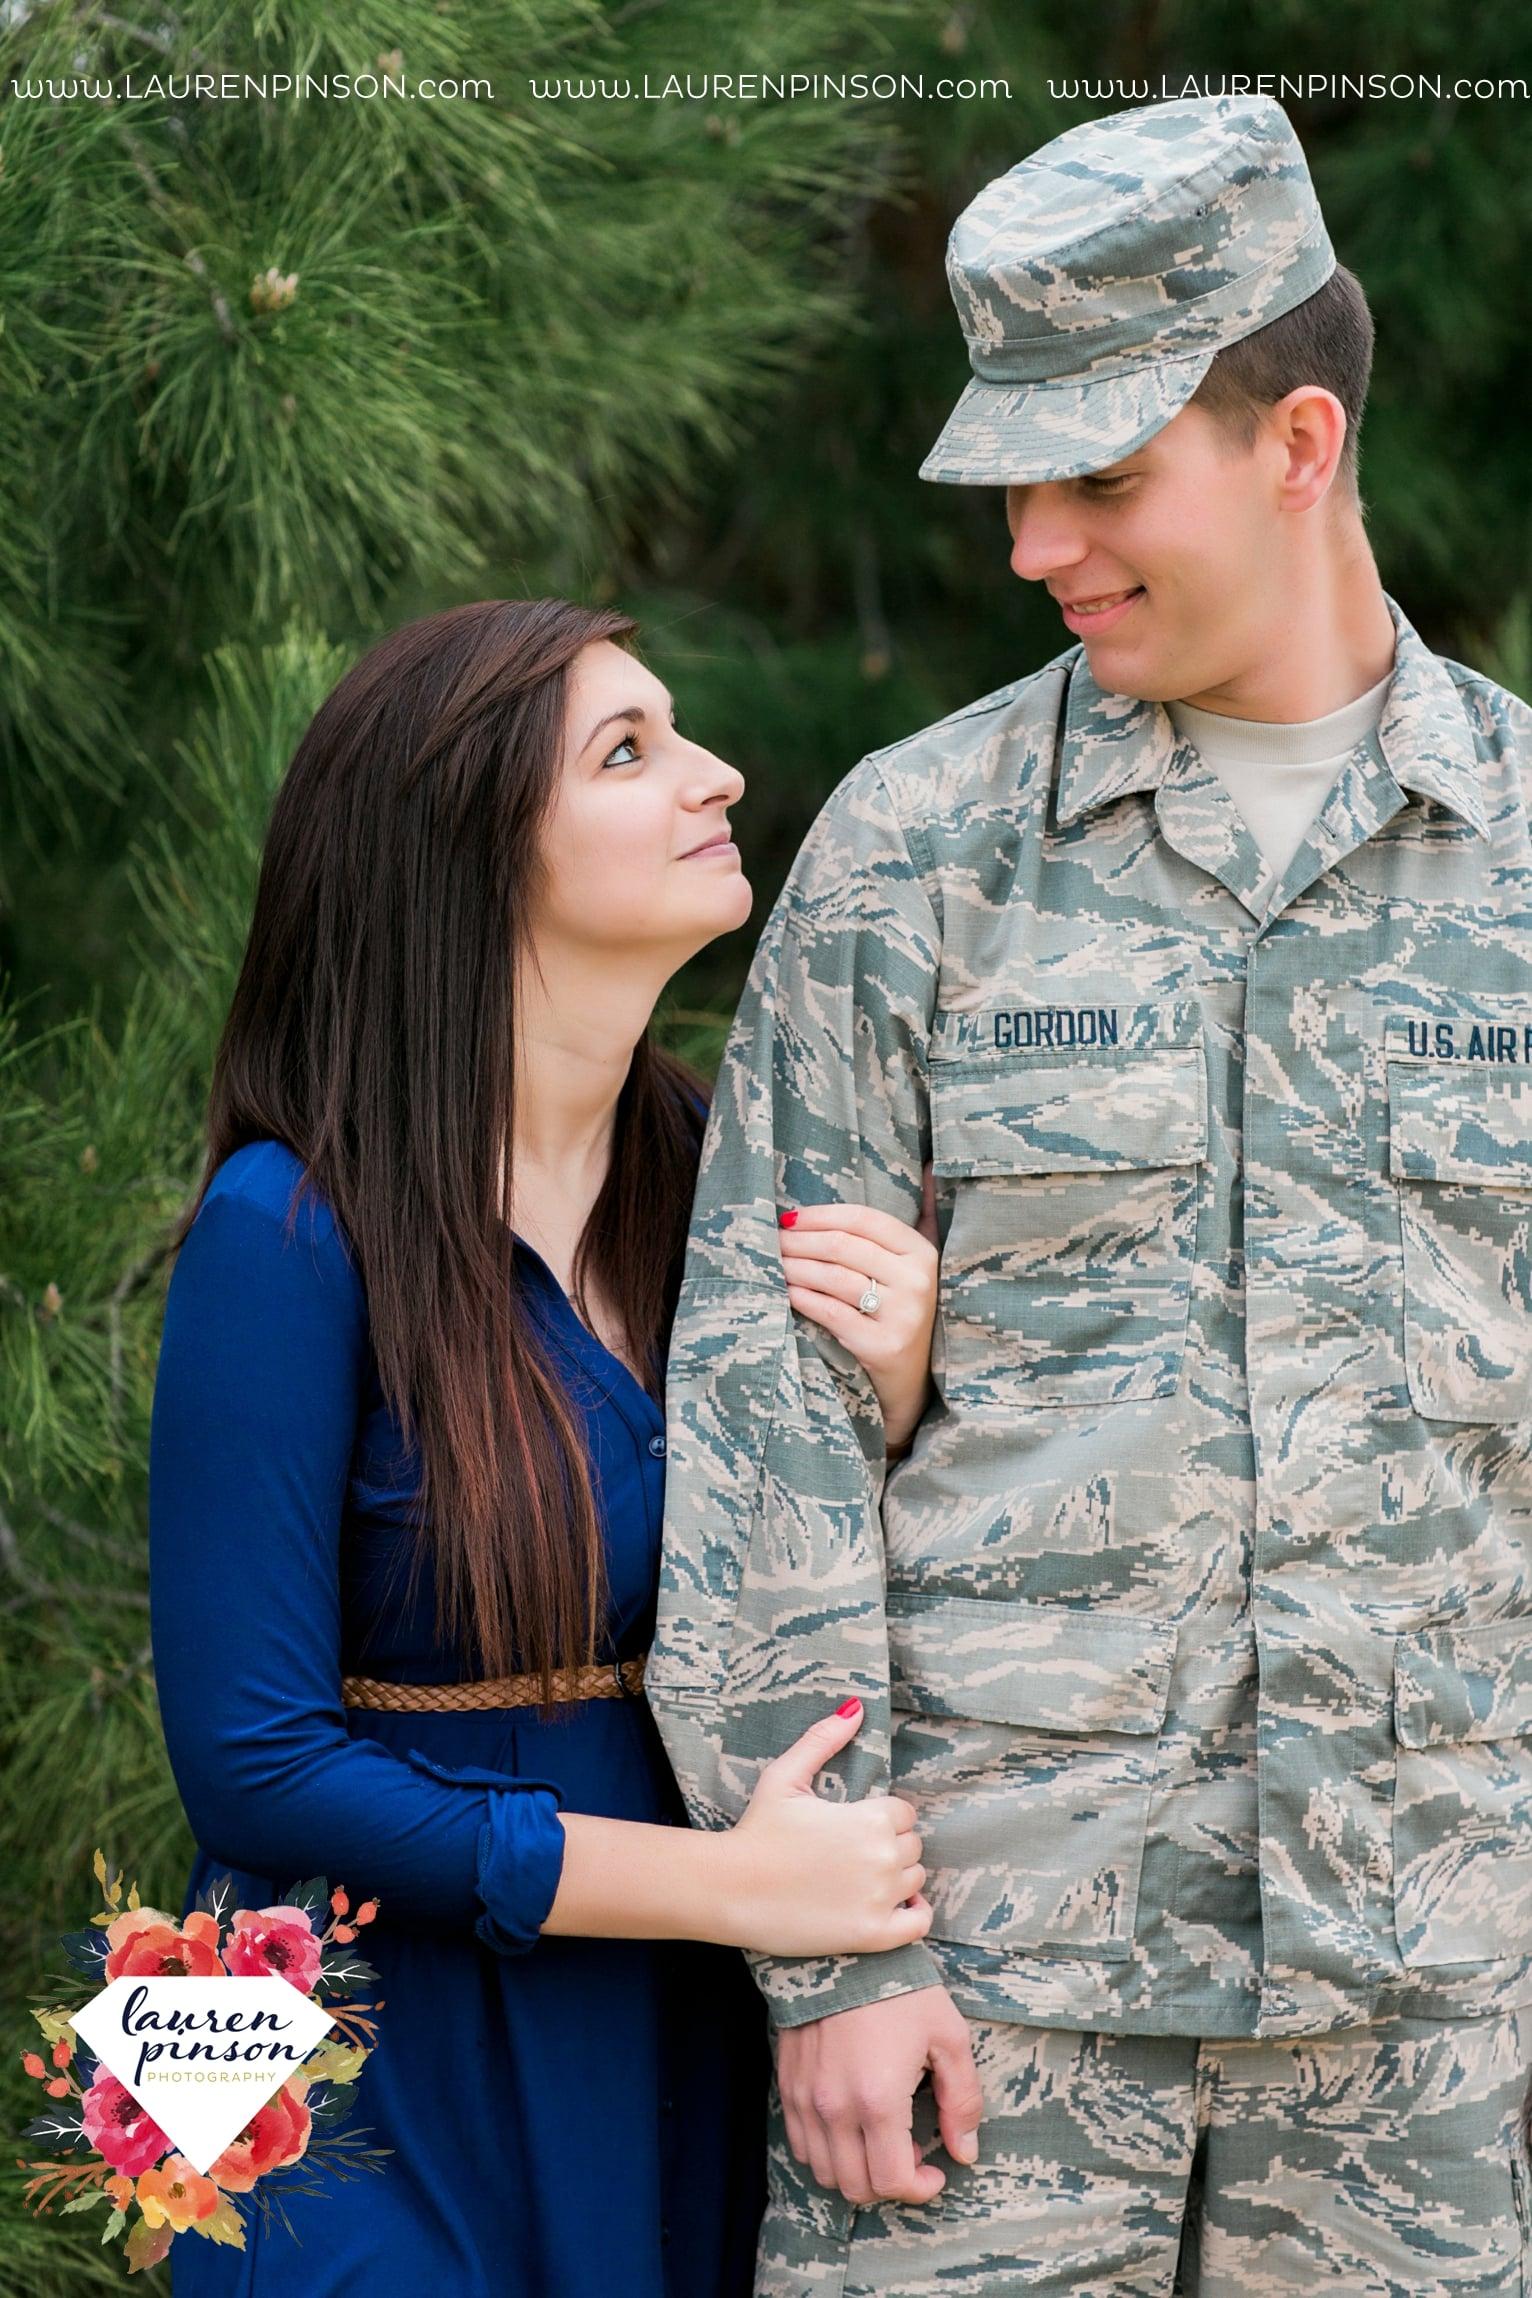 sheppard-afb-wichita-falls-engagement-session-airmen-in-uniform-abu-airplanes-bride-engagement-ring-texas-air-force-base_1997.jpg